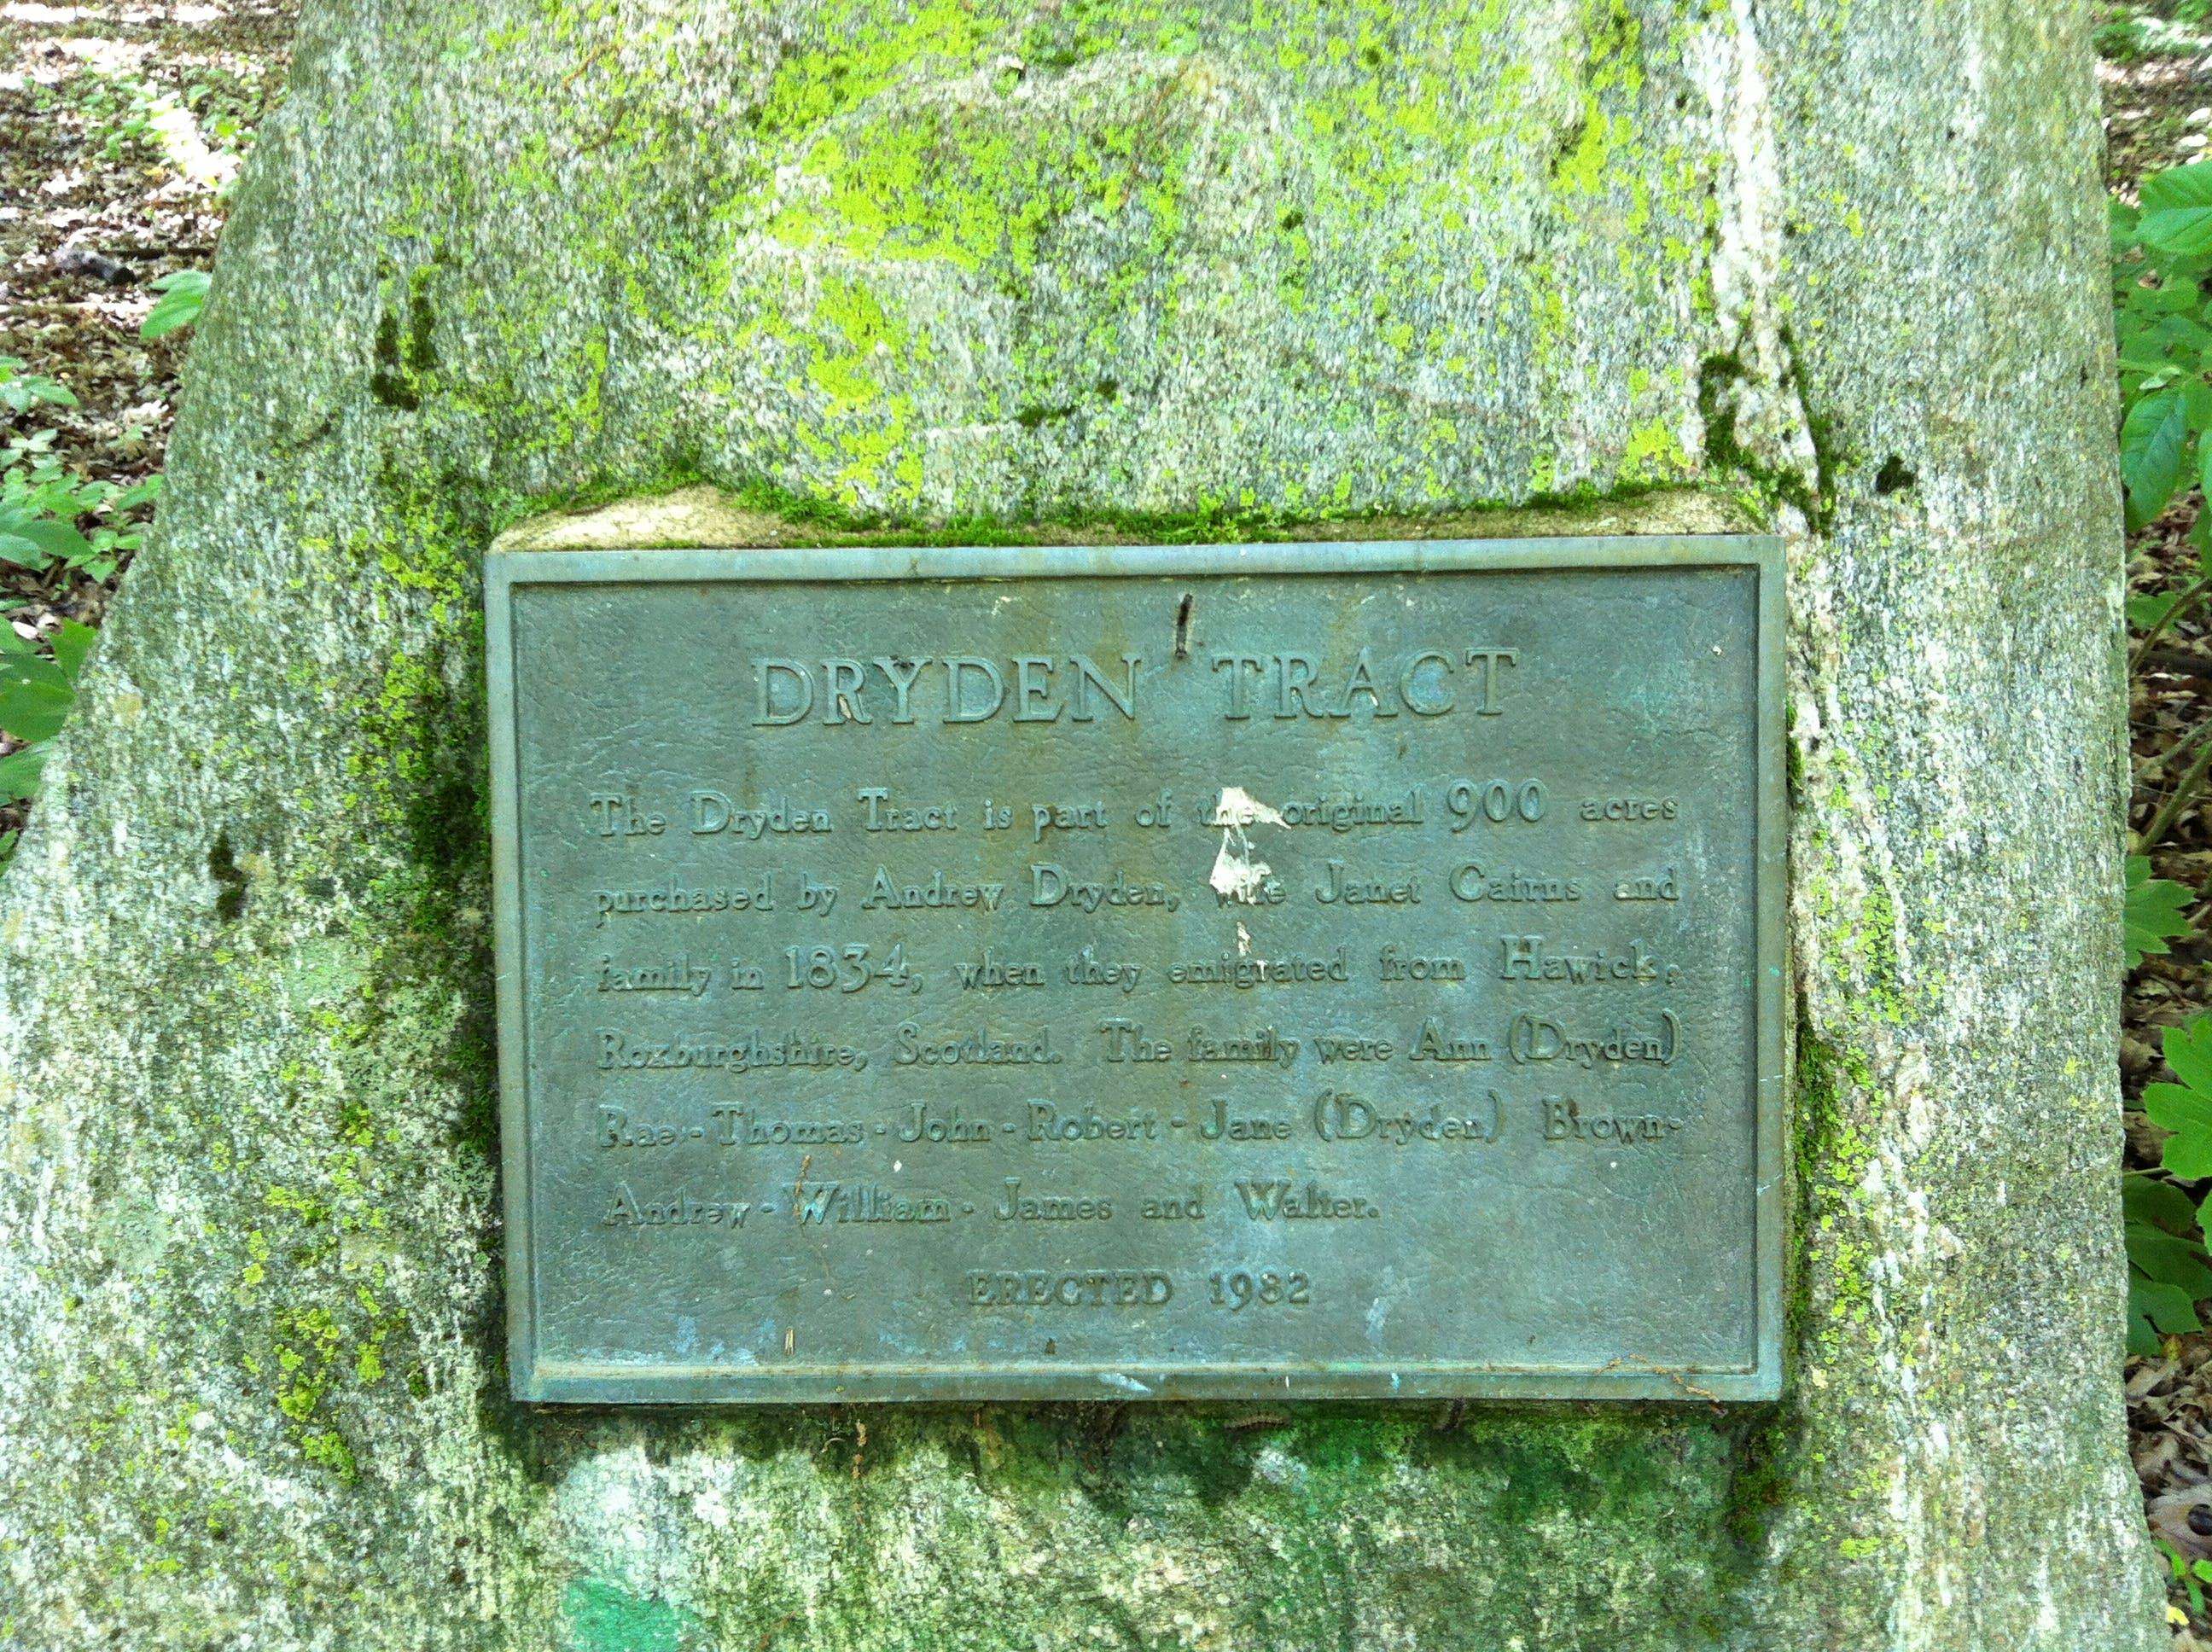 Dryden Tract Cairn